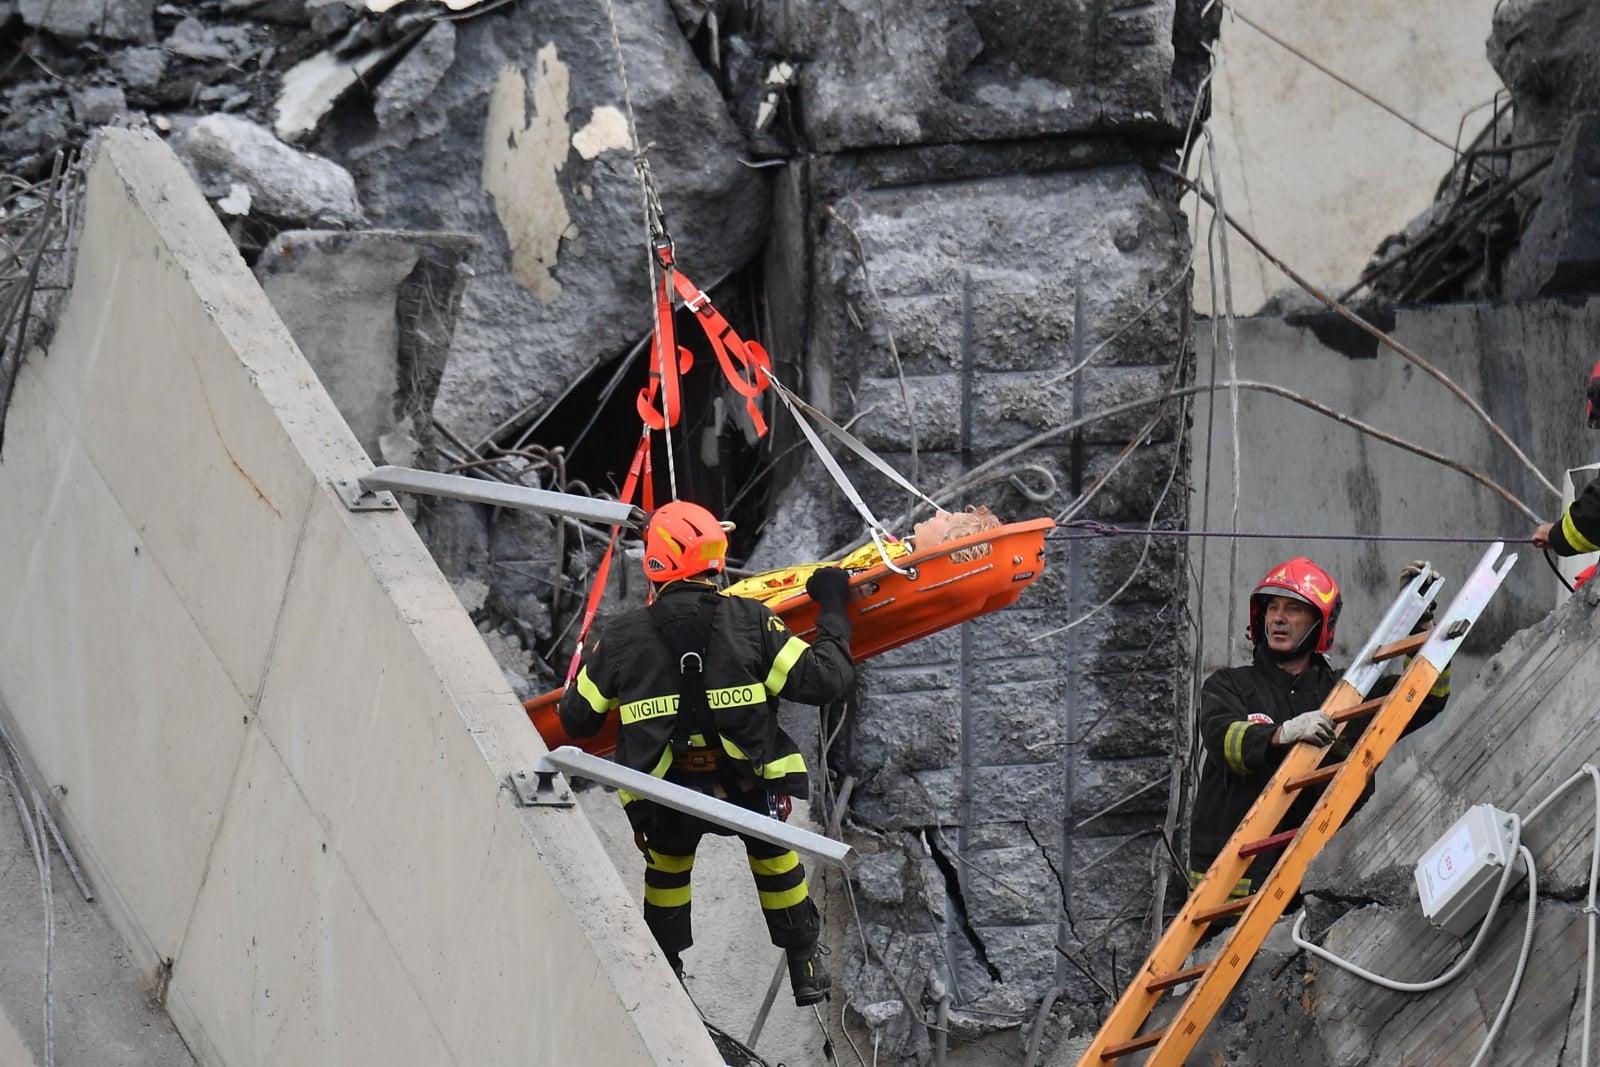 fot. EPA/LUCA ZENNARO